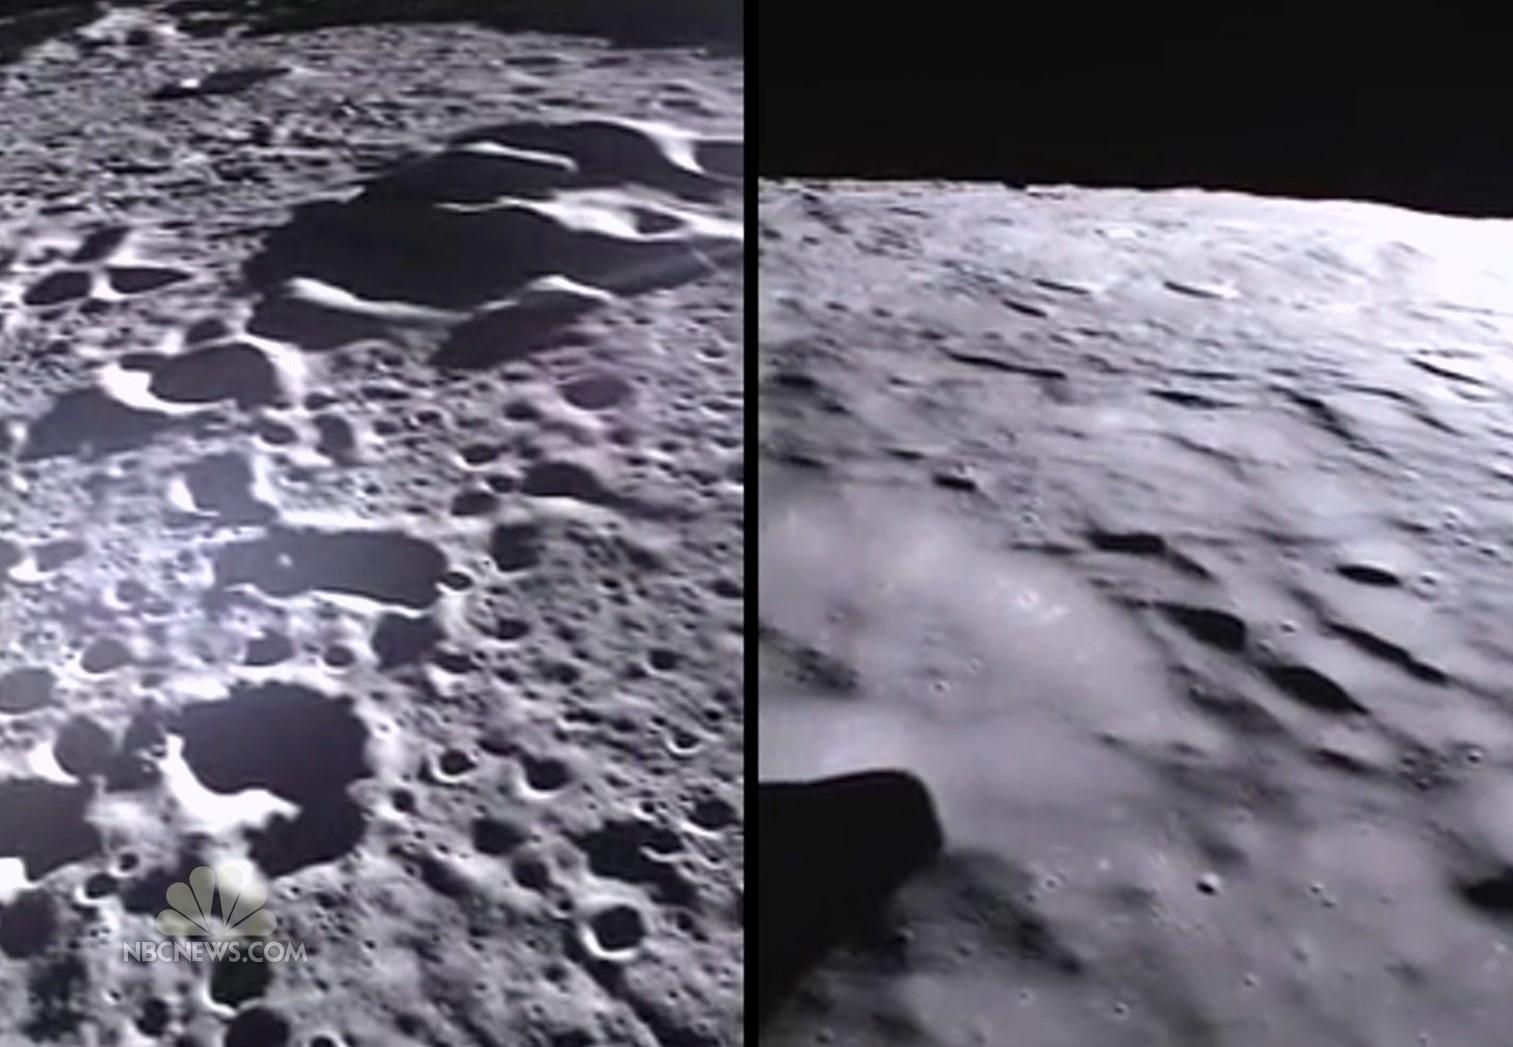 NASA's GRAIL Mission Captures New Images of Lunar Surface